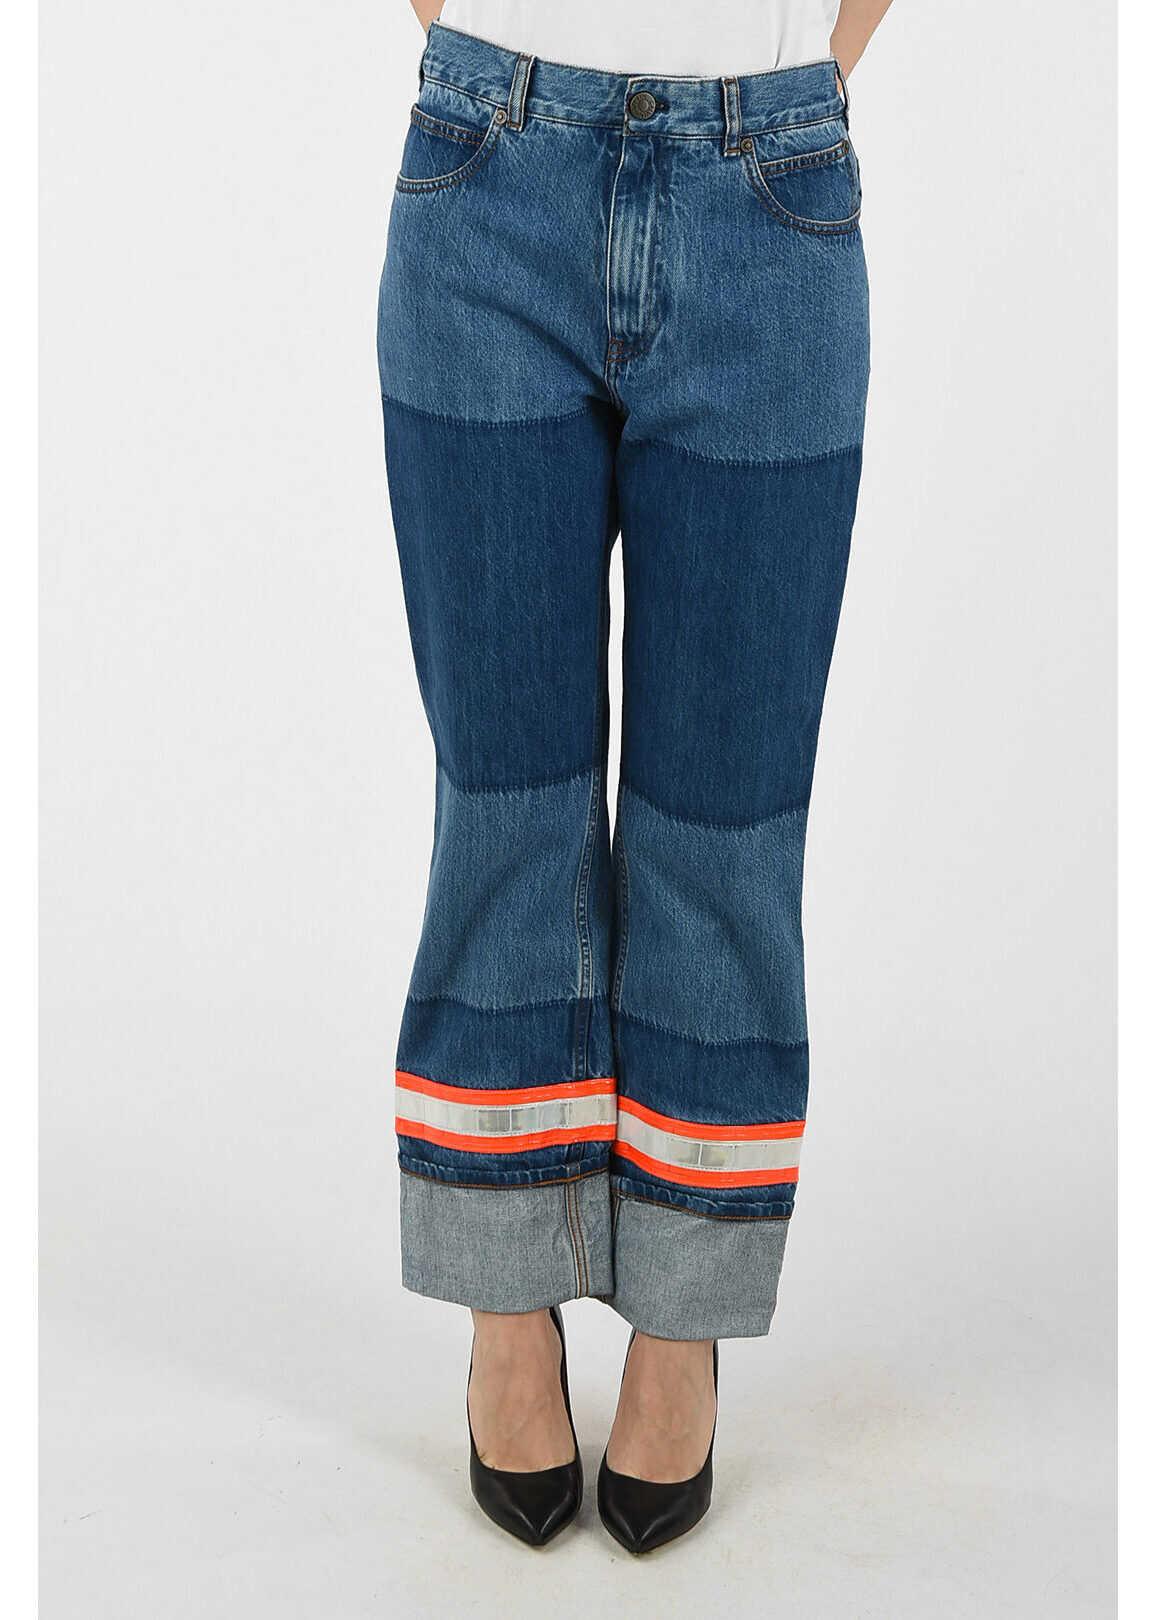 Calvin Klein 205W39NYC bootcut jeans BLUE